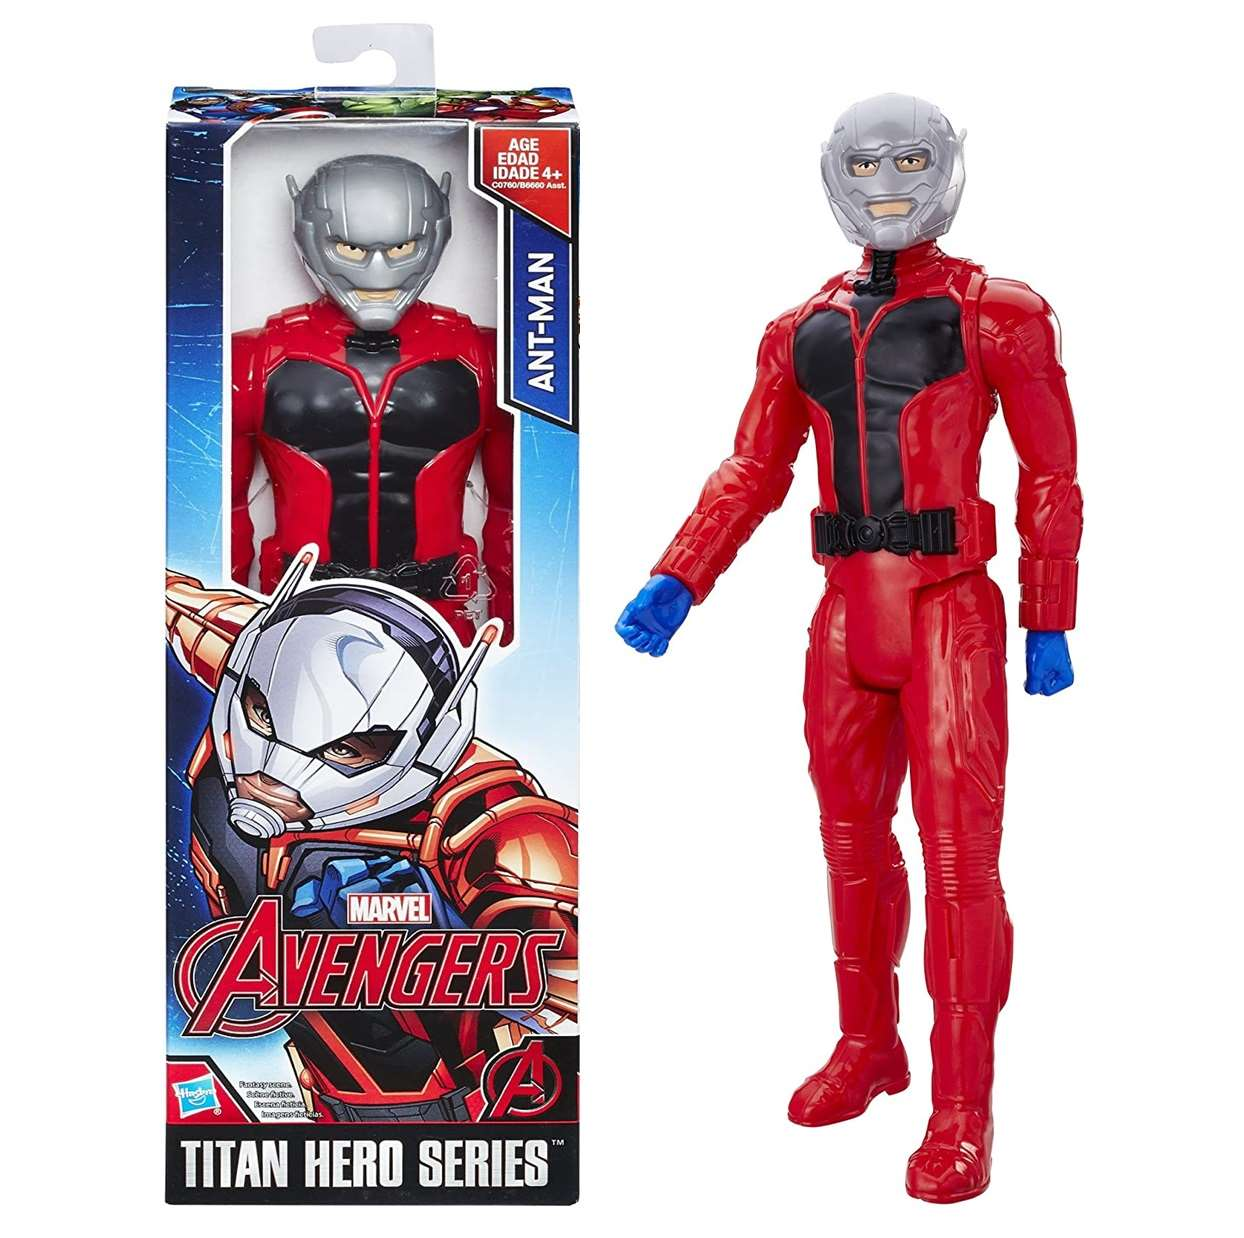 Ant Man Figura Avengers Titan Hero Series 12 PuLG